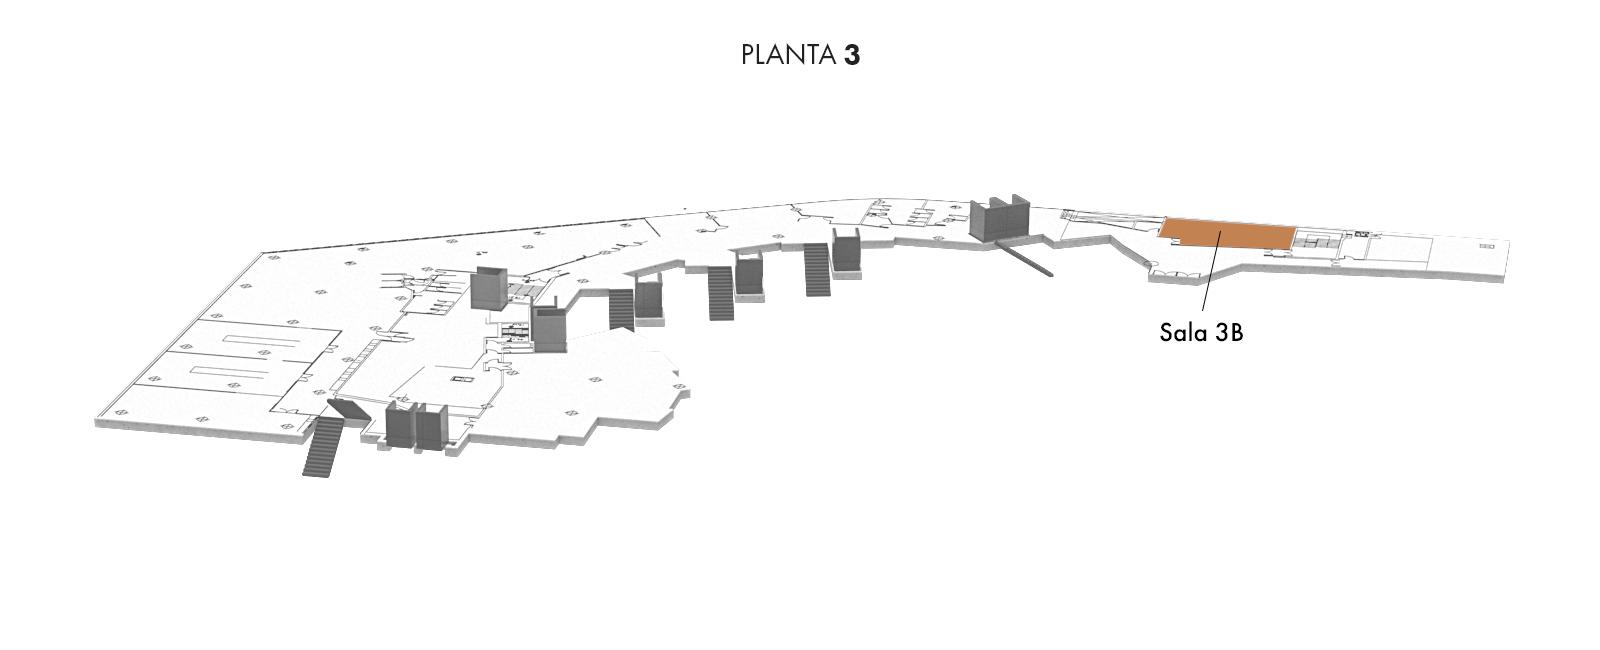 Sala 3B, Planta 3 | Palacio Euskalduna Jauregia